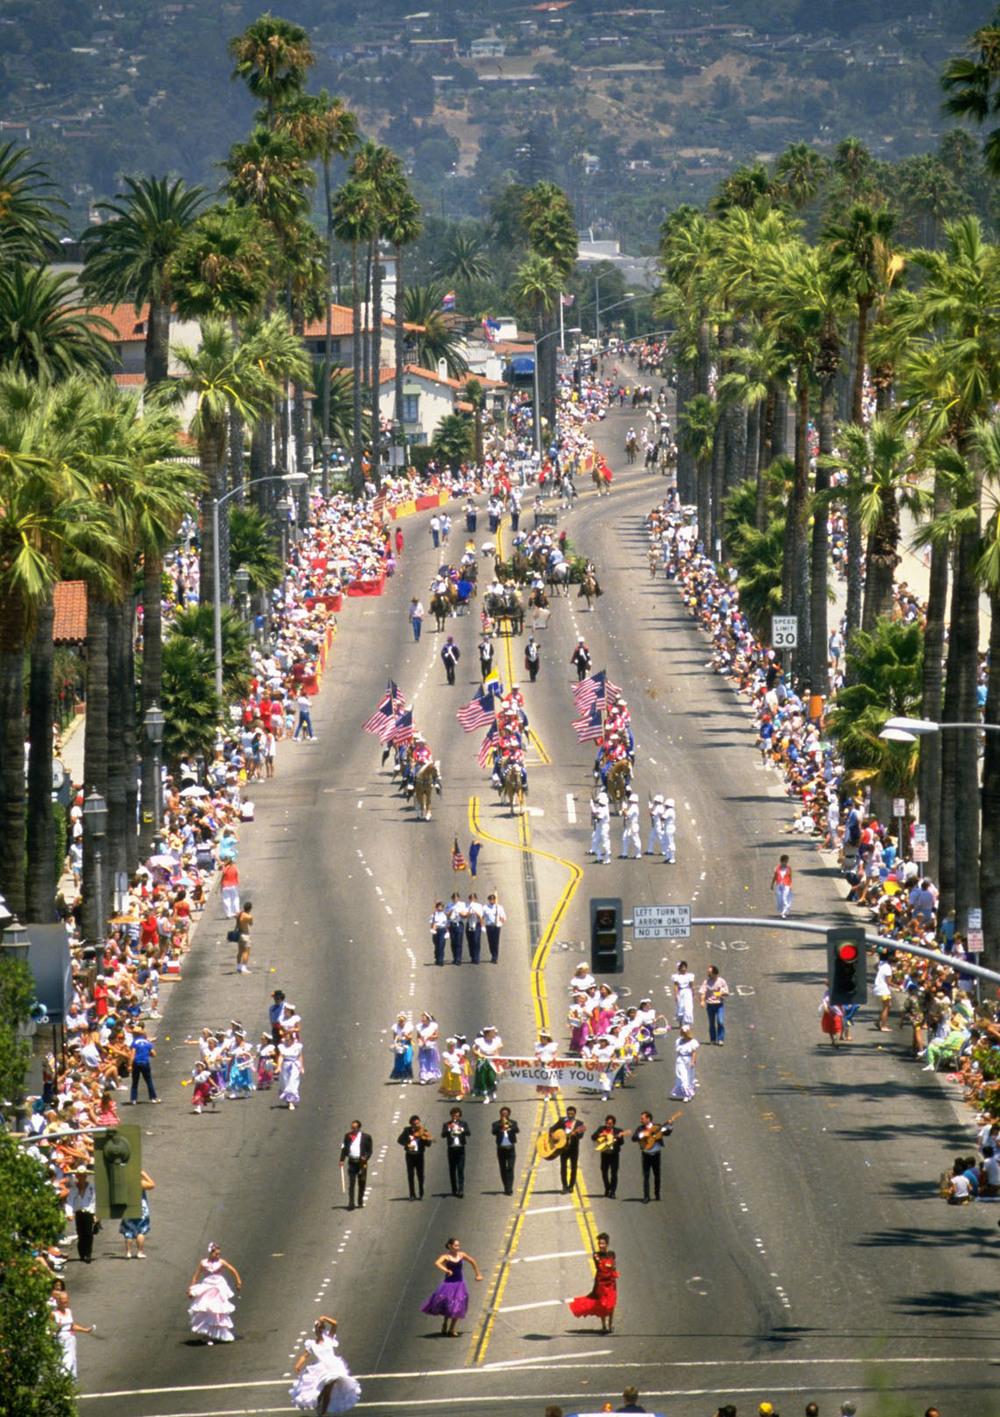 Pate_Fiesta_Parade.jpg